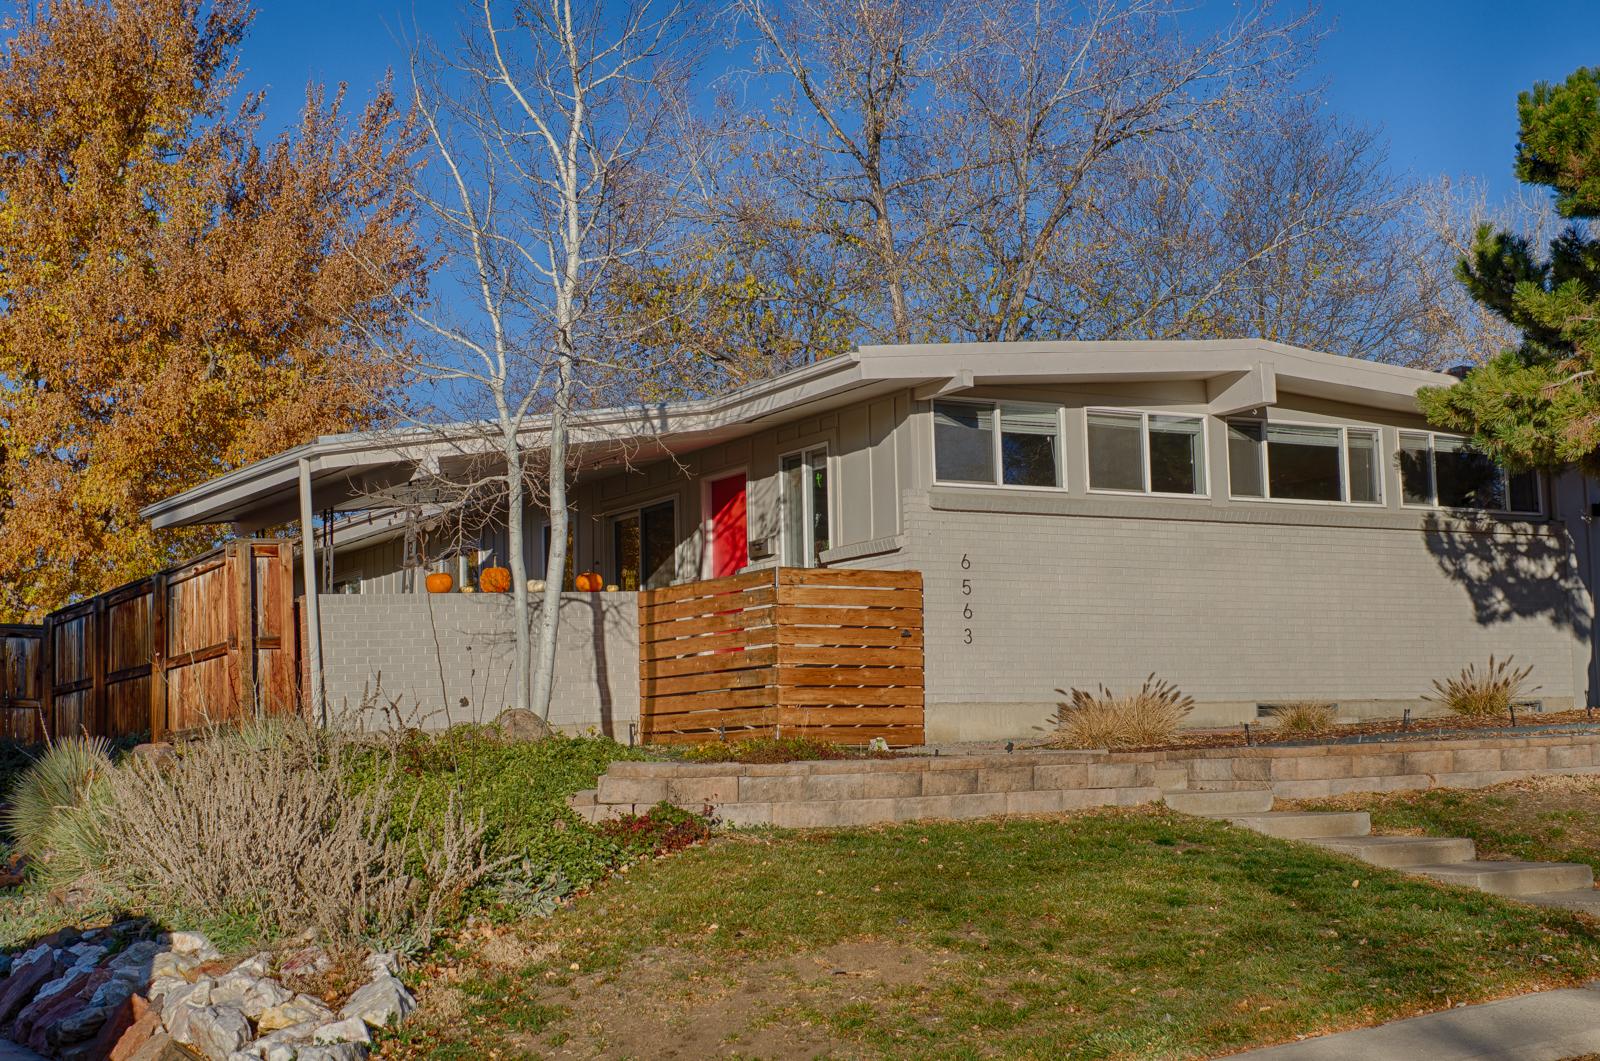 Adrian-Kinney-Dream-House-Acres-12.jpg